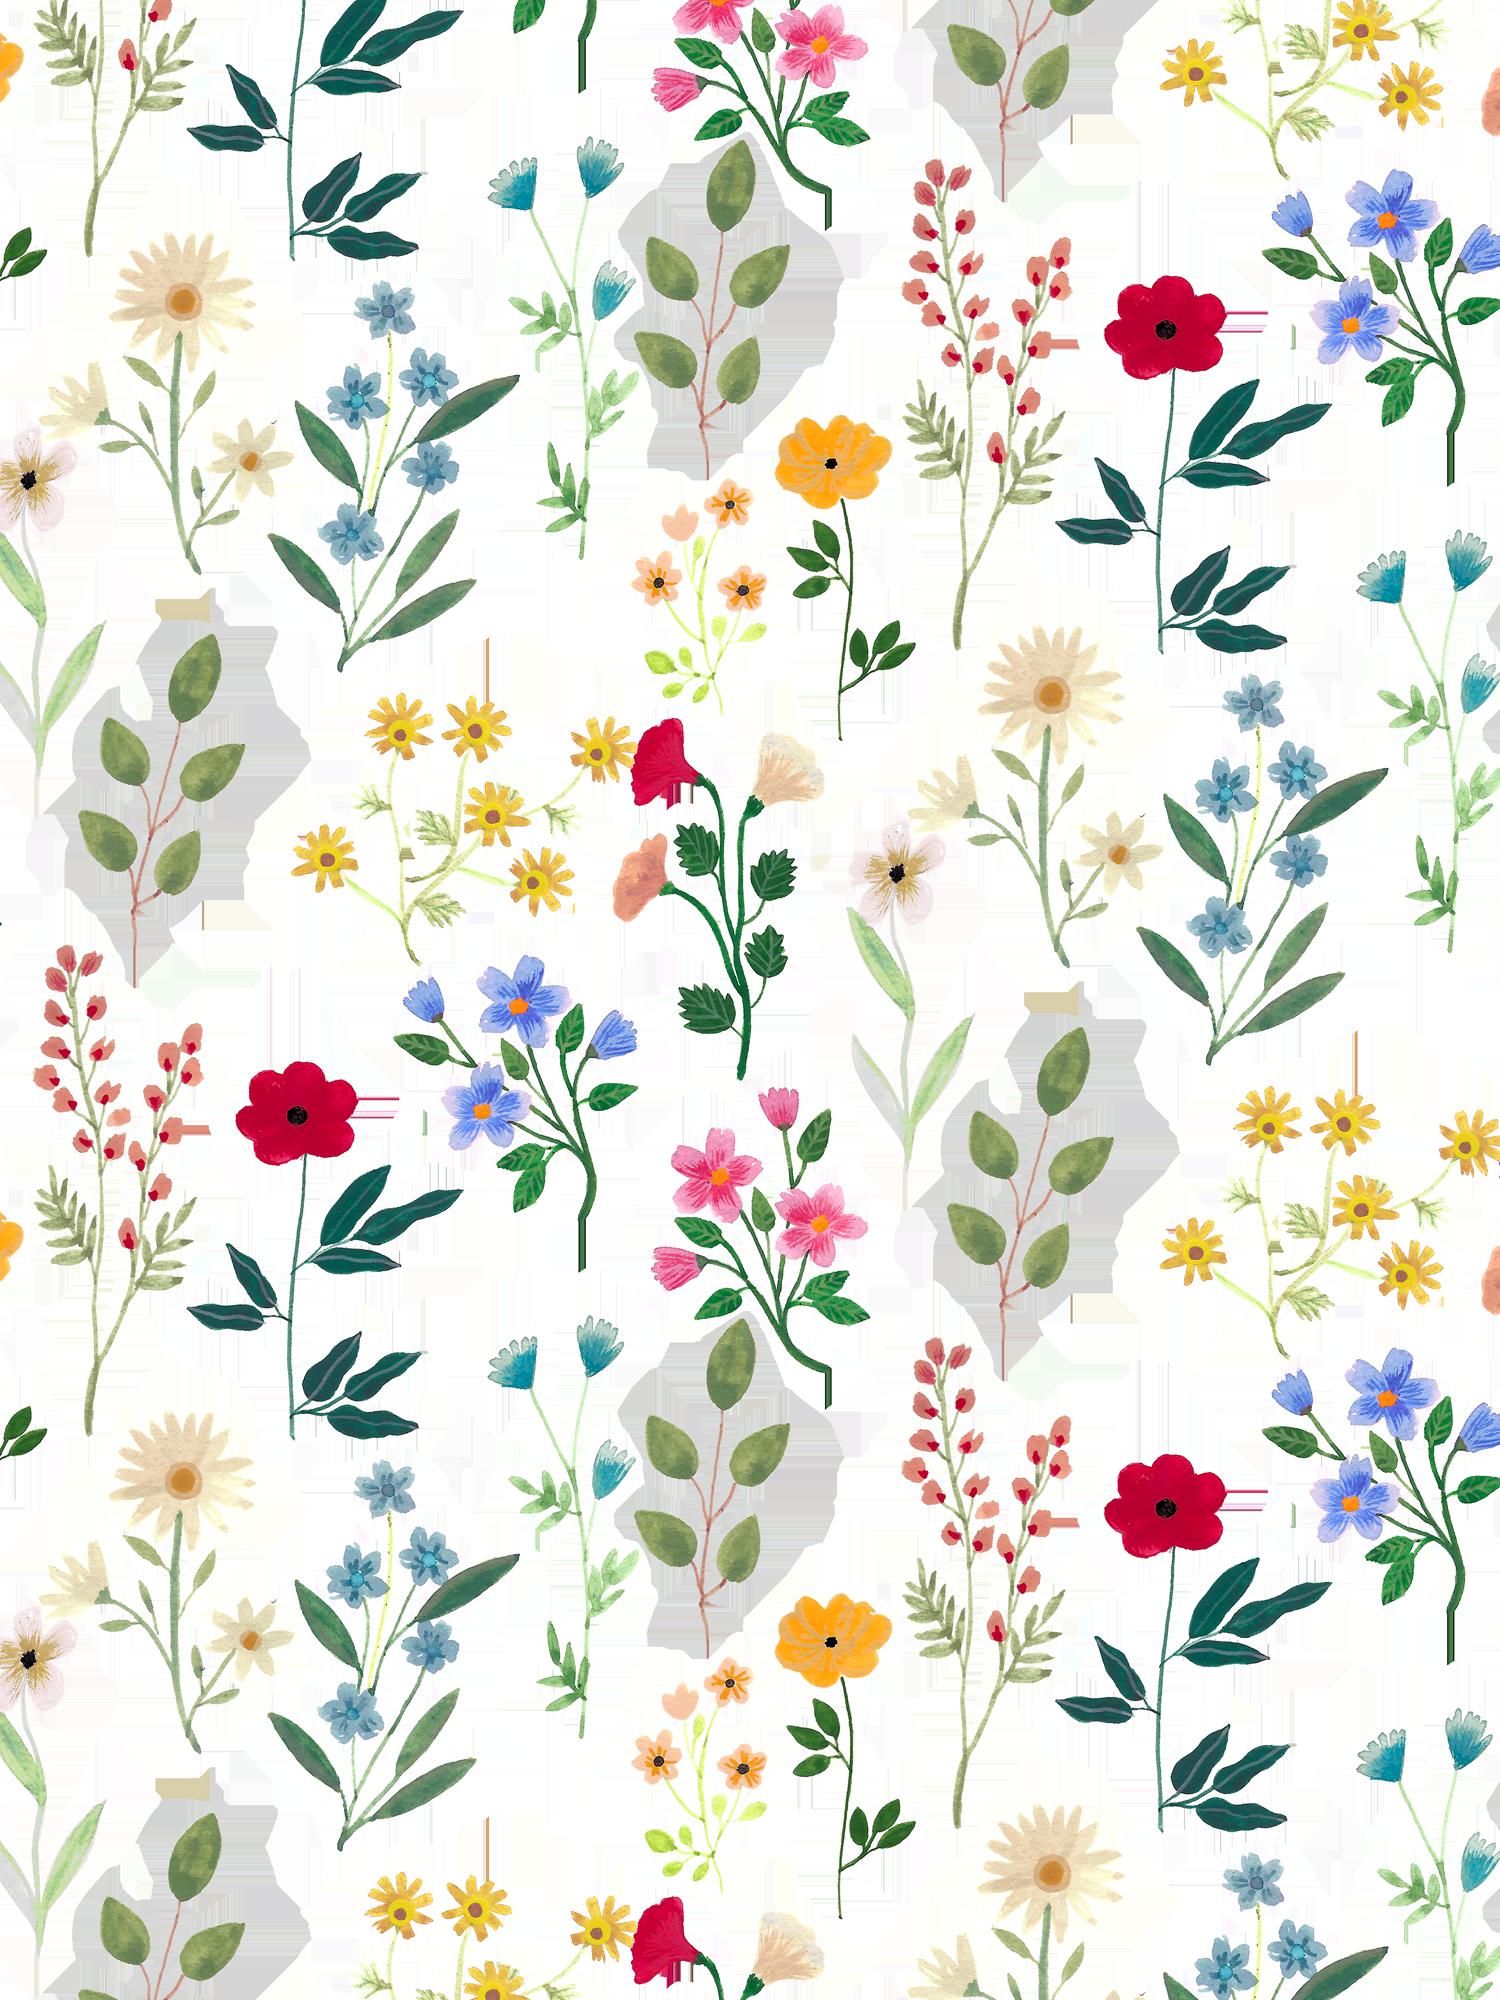 iPhone XS Case Spring Botanicals 2 by Iisa Mönttinen in